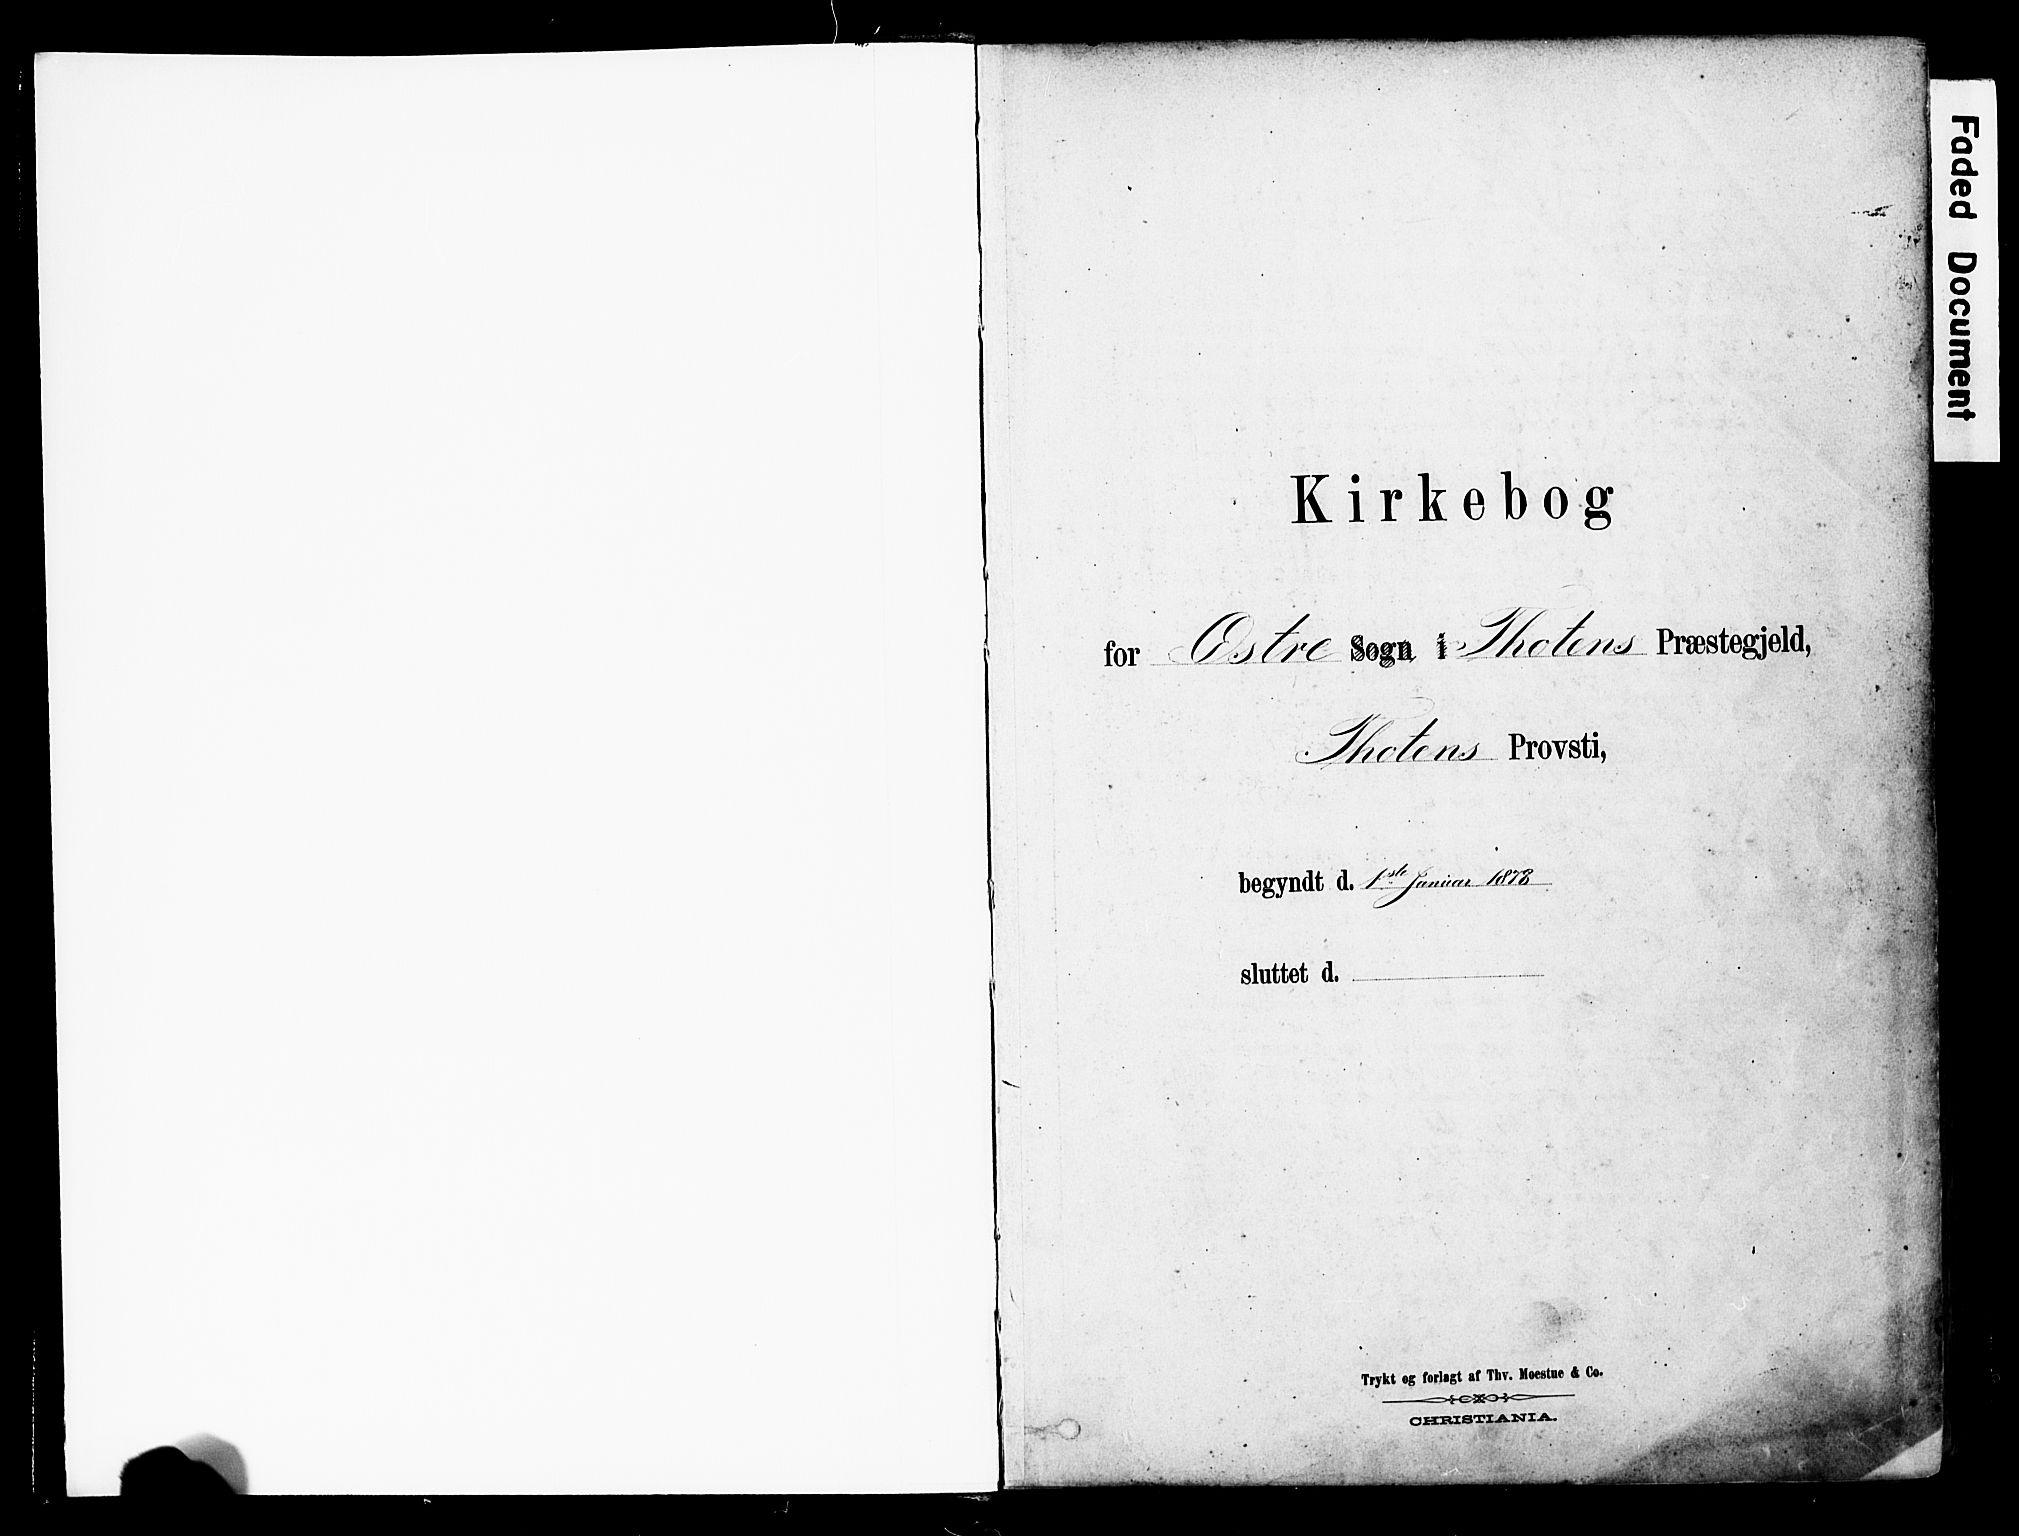 SAH, Østre Toten prestekontor, Ministerialbok nr. 6 /1, 1878-1896